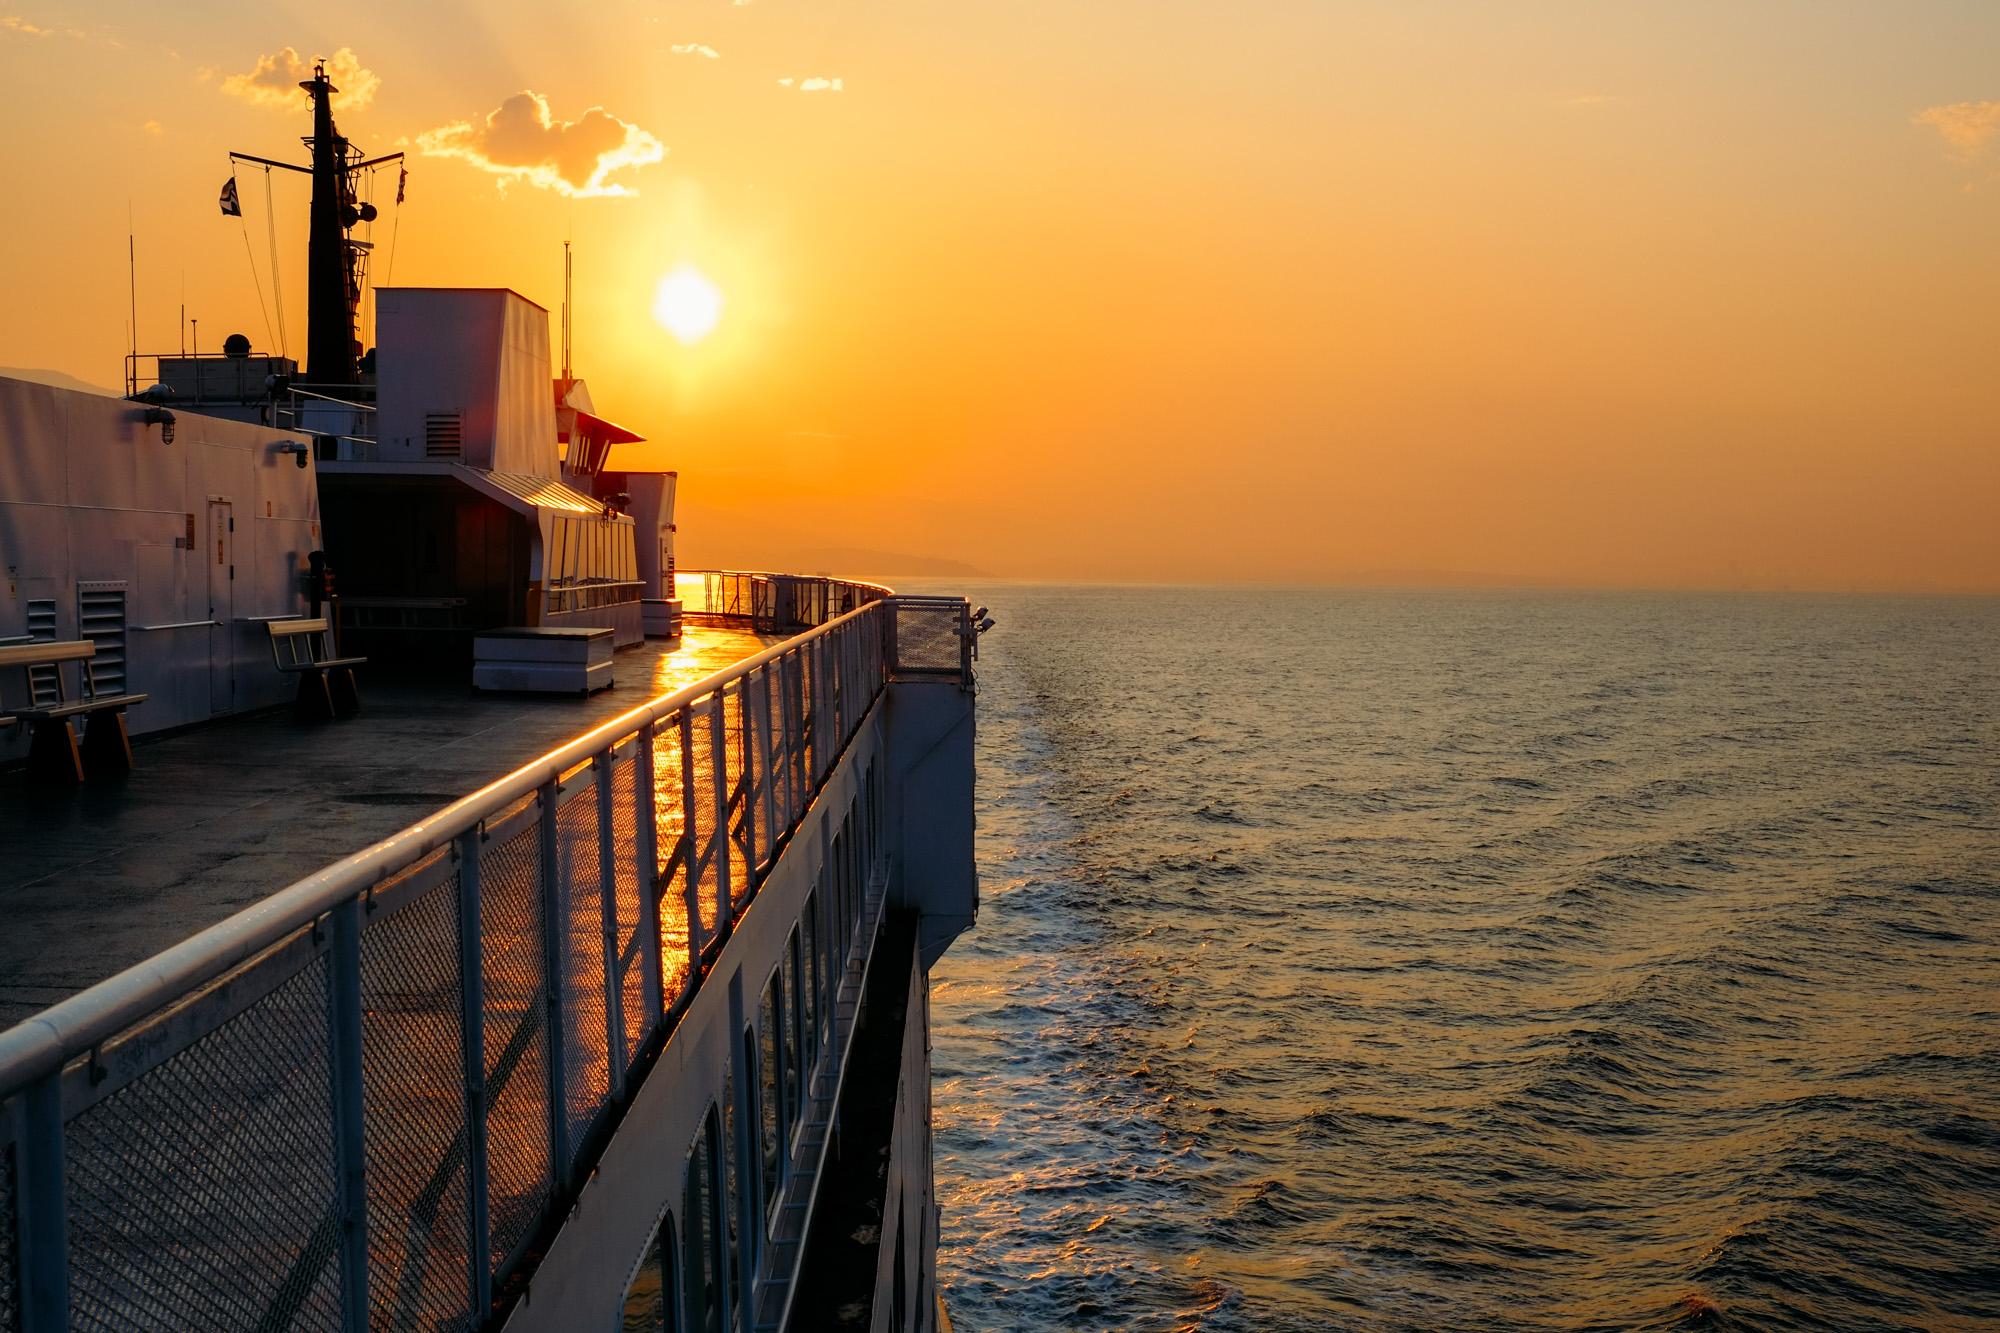 Sun rise on the BC Ferry crossing the Salish Sea